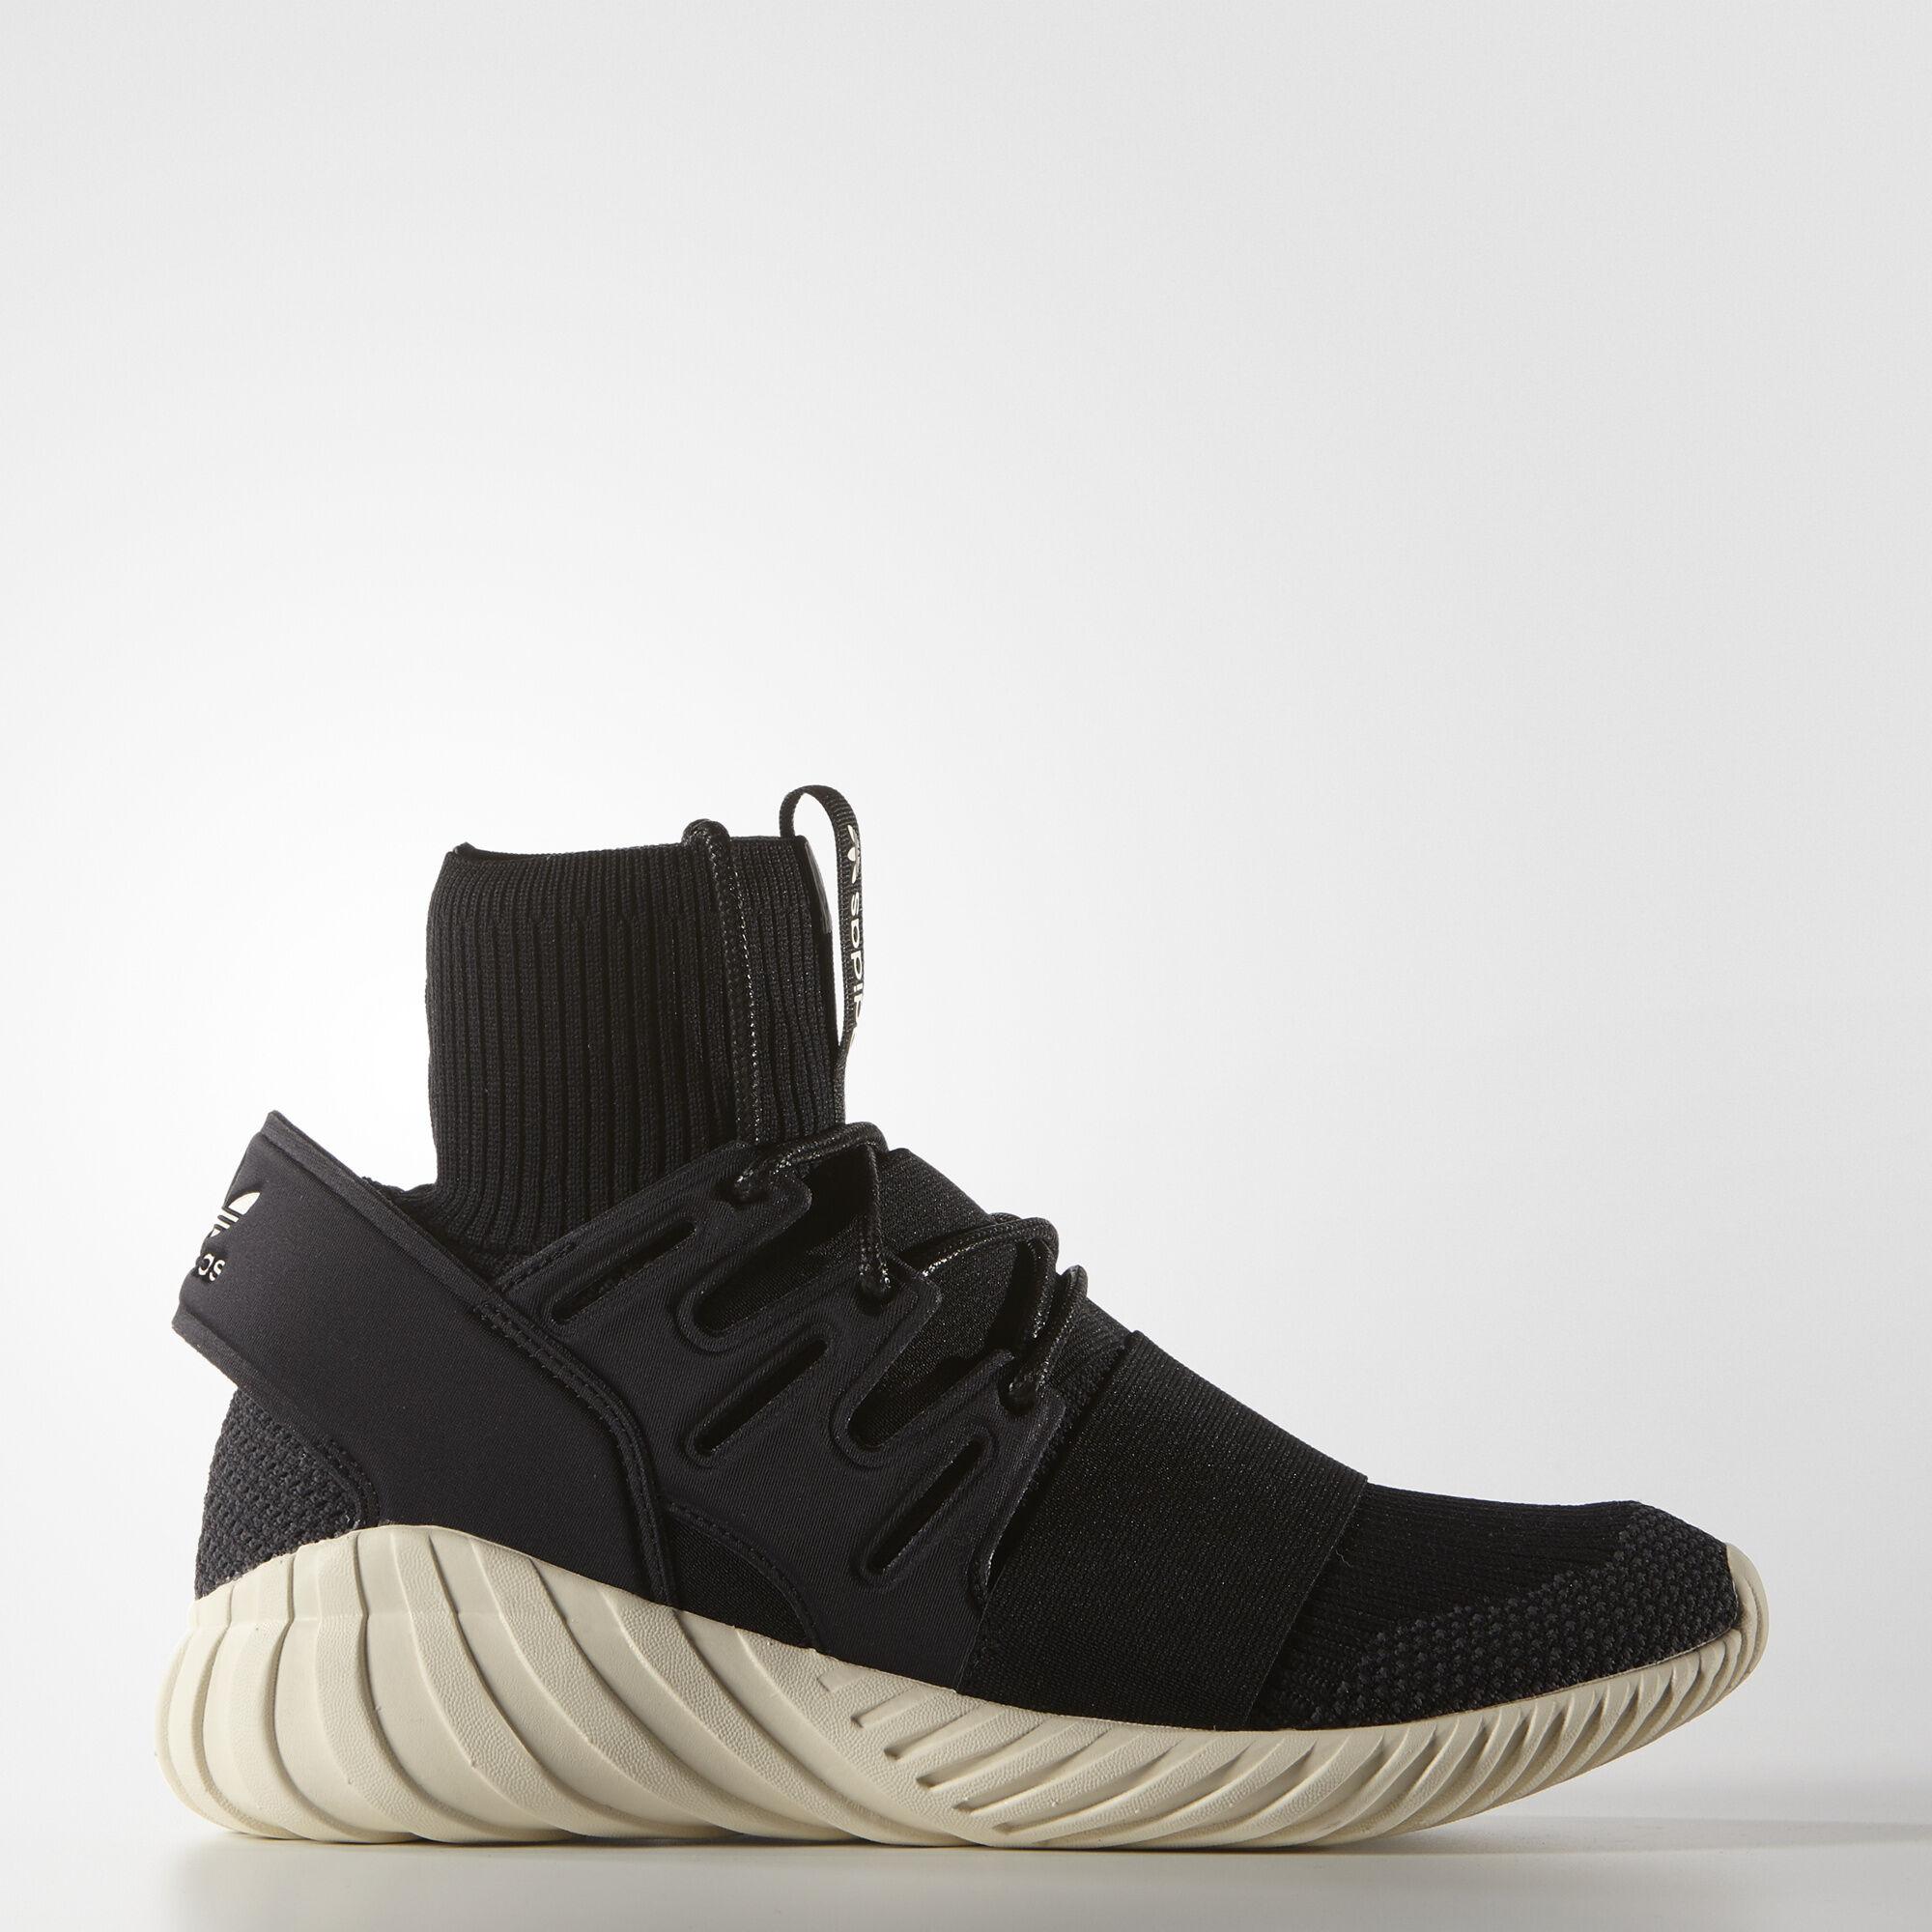 Adidas Tubular Primeknit Shoes